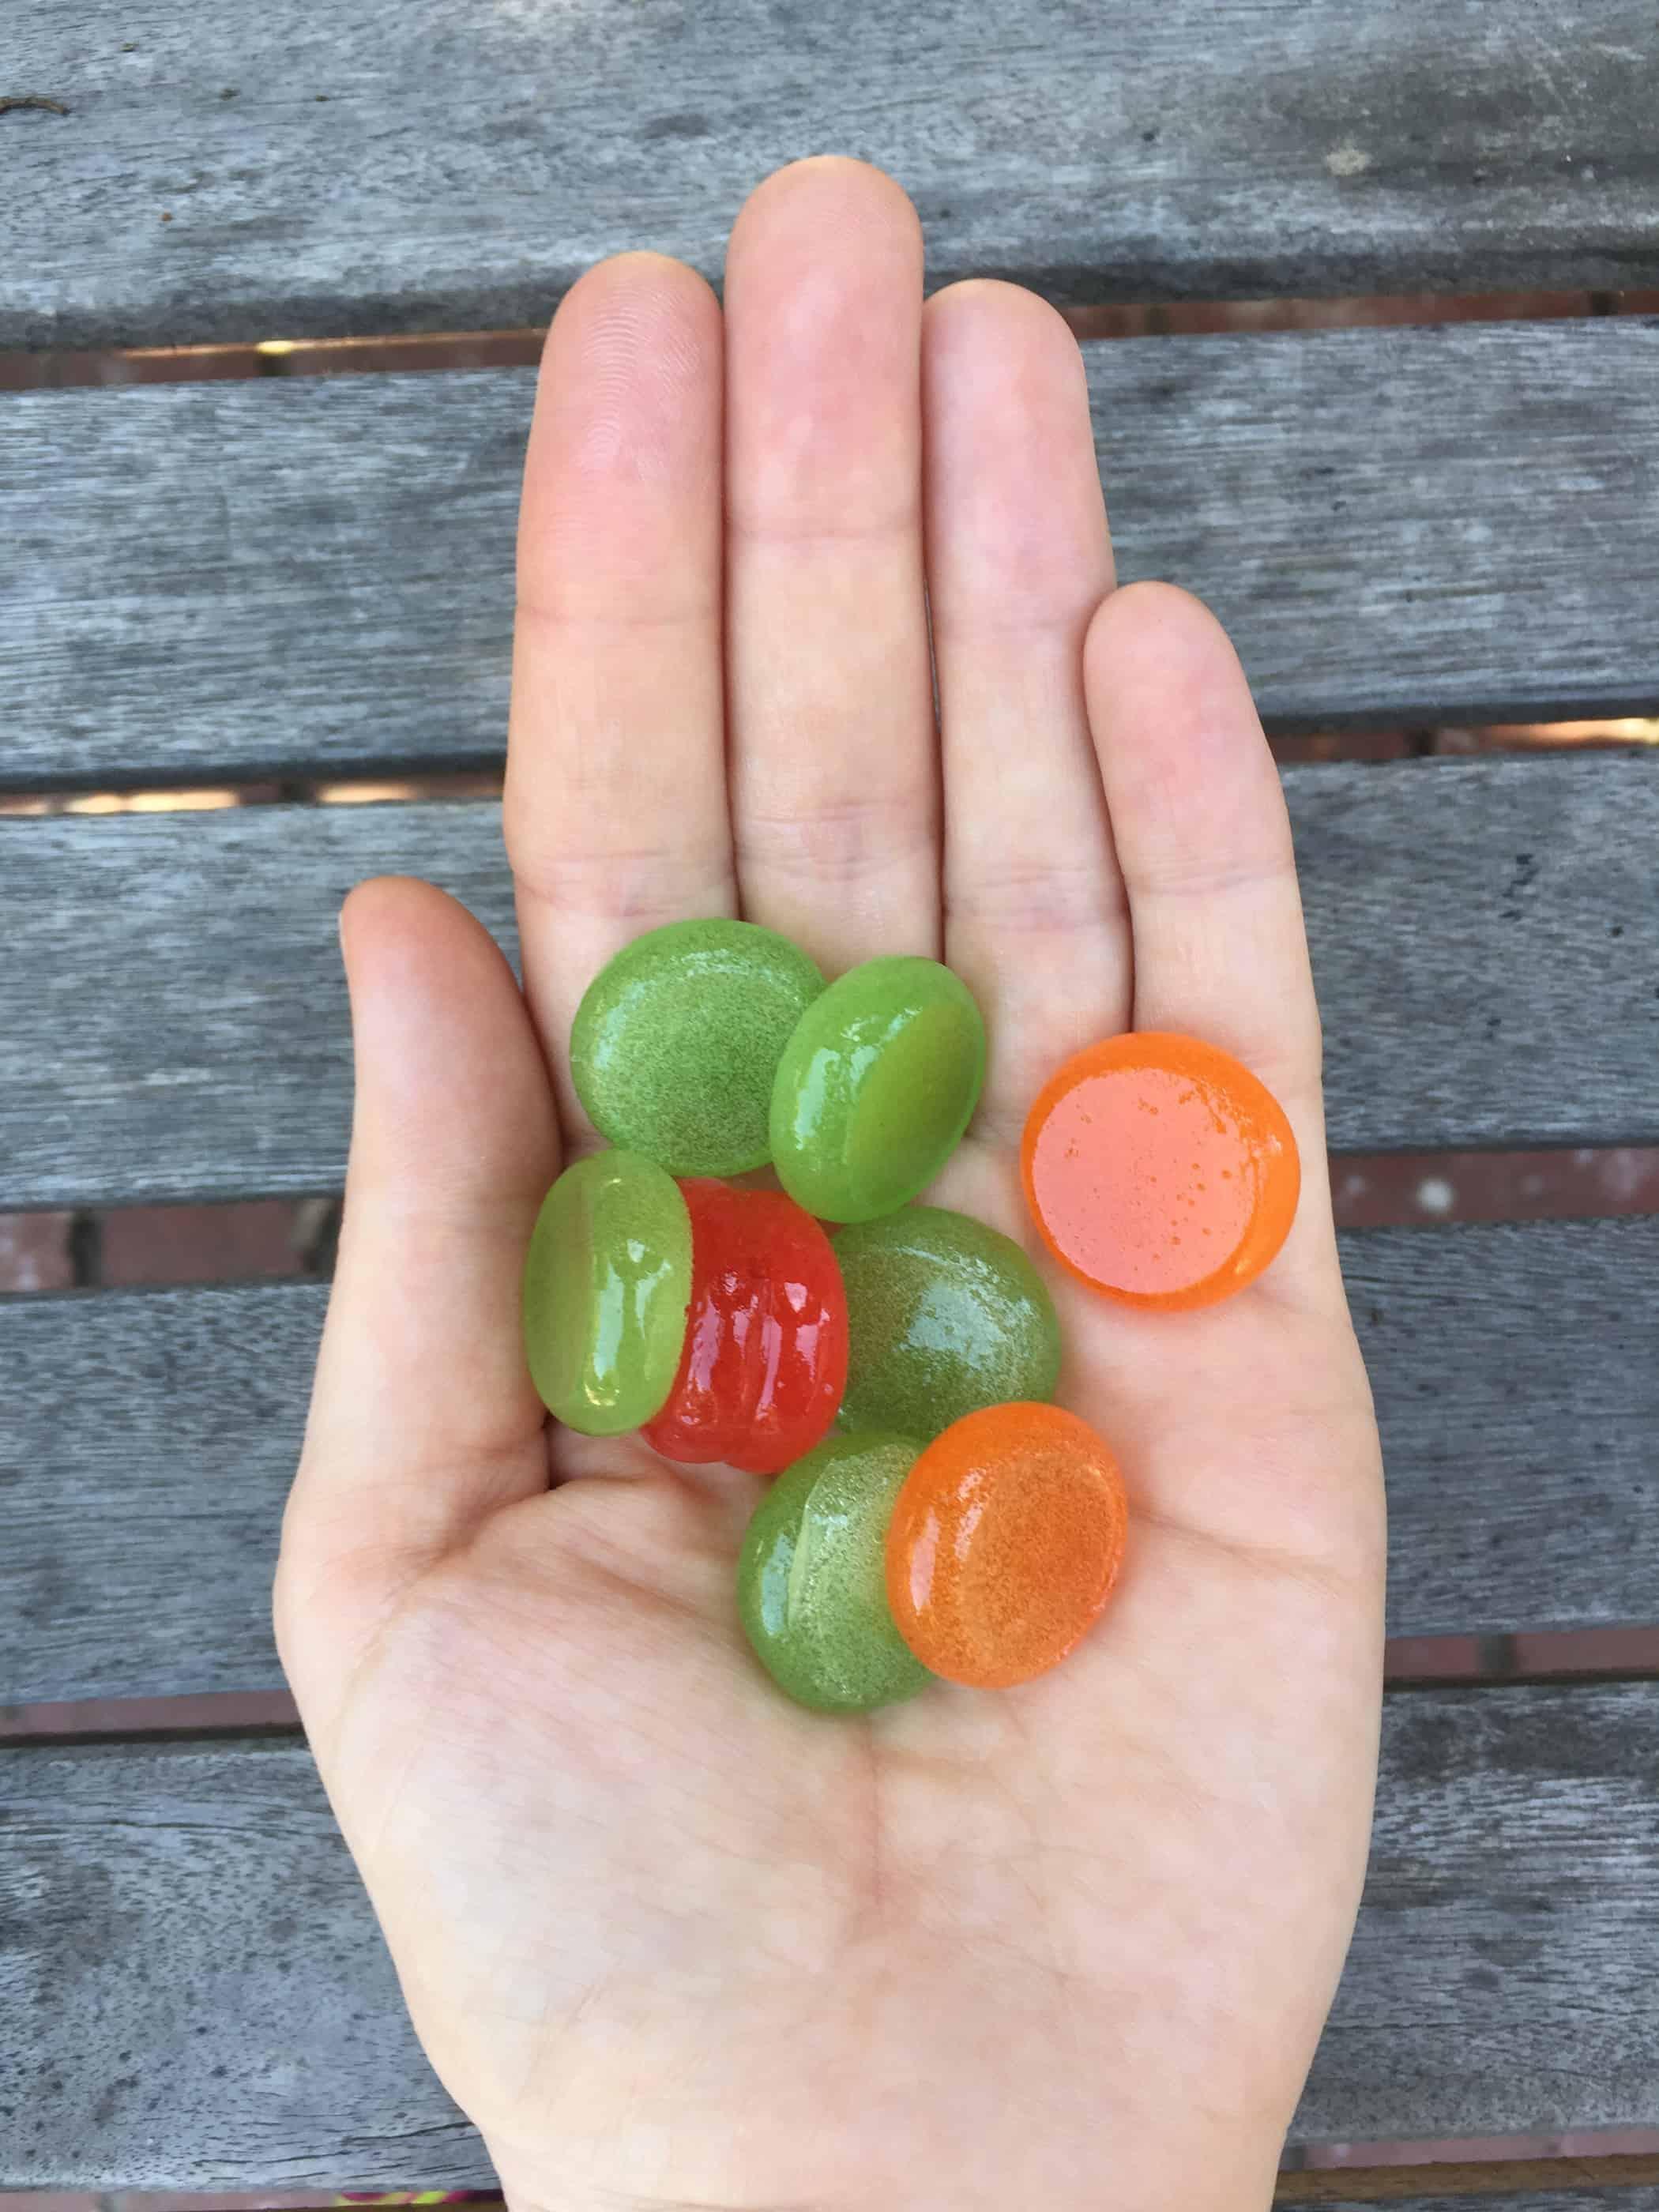 calm by wellness hemp cbd gummies save on cannabis Beauty shot